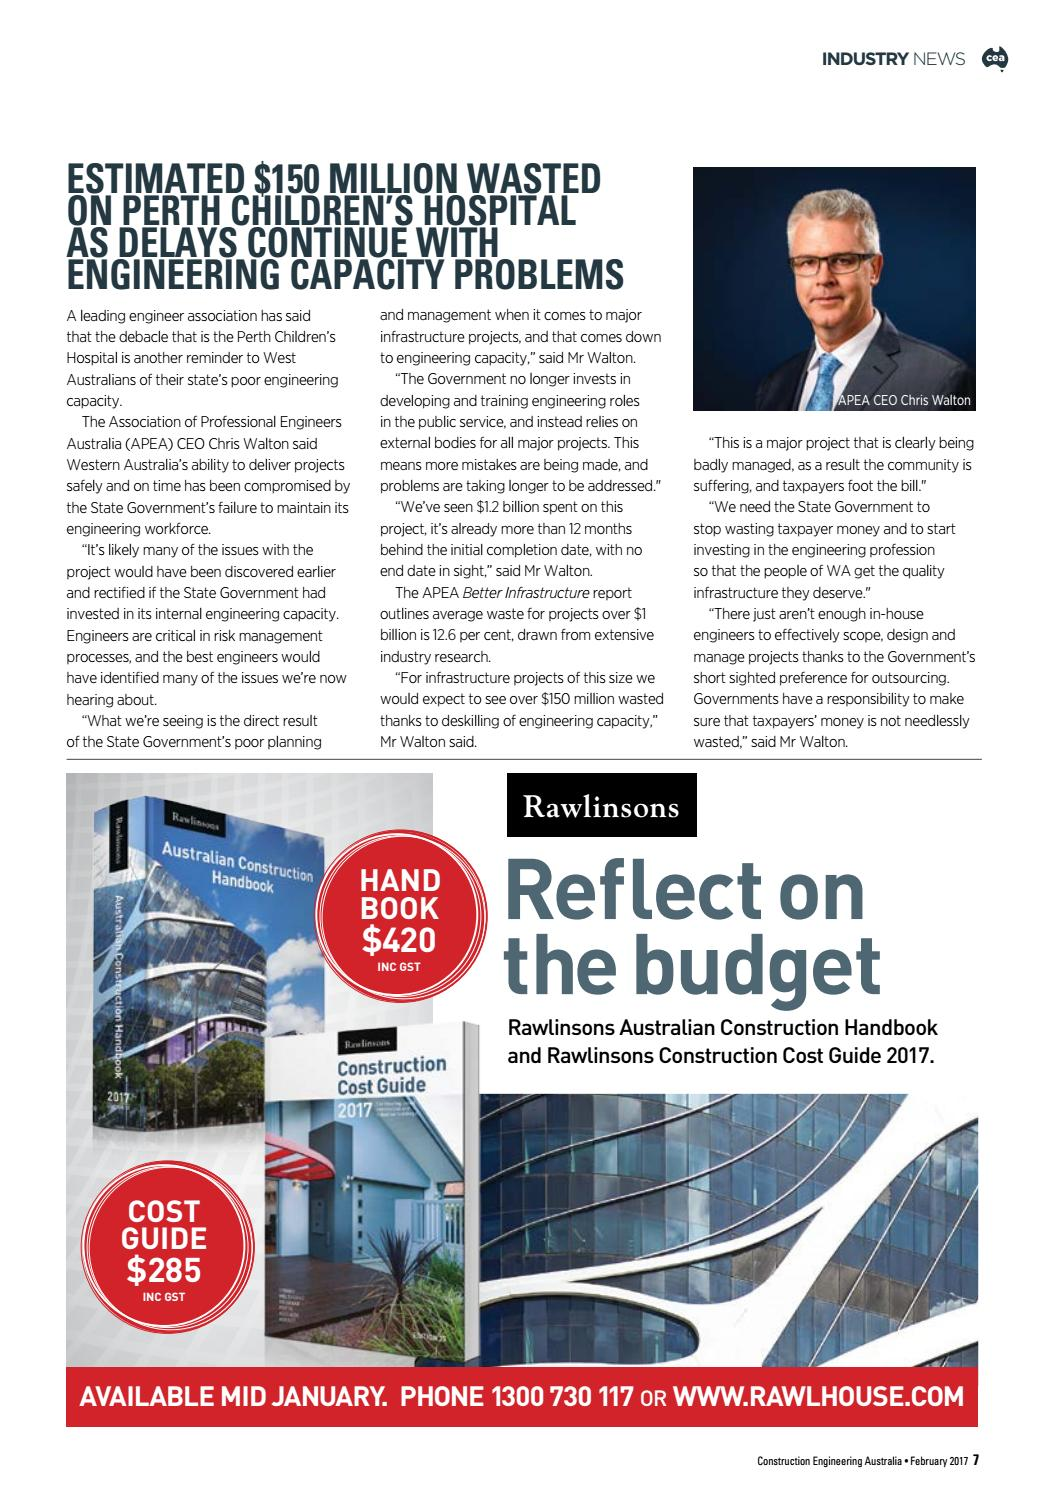 Rawlinsons australian construction handbook 2015 pdf